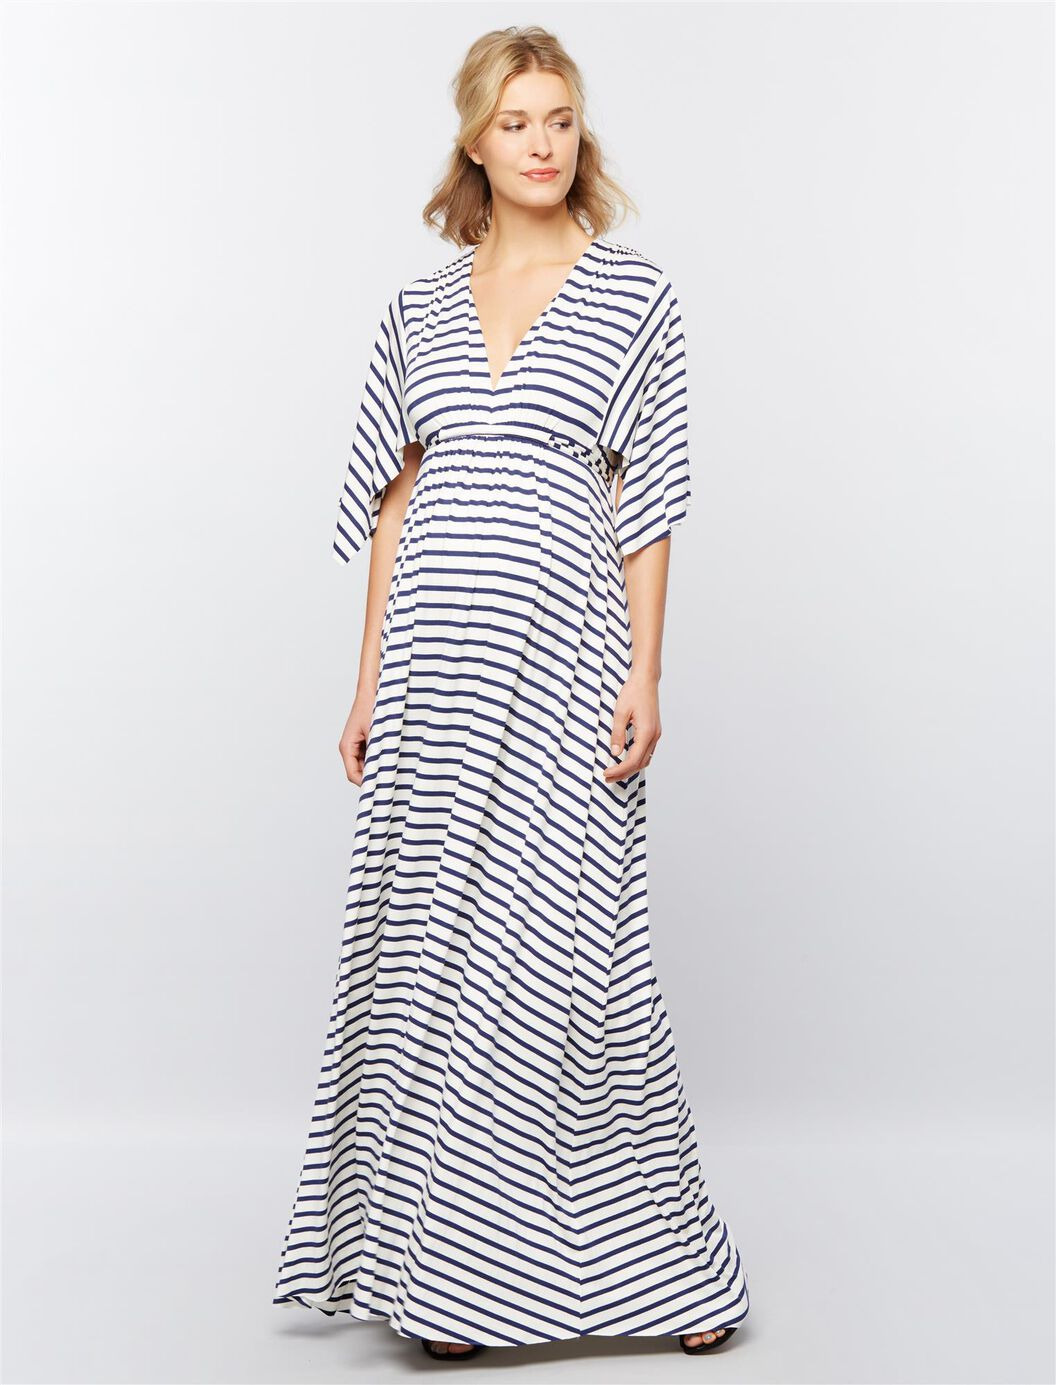 Rachel pally striped caftan maternity maxi dress destination rachel pally striped caftan maternity maxi dress stripe whiteblue ombrellifo Images